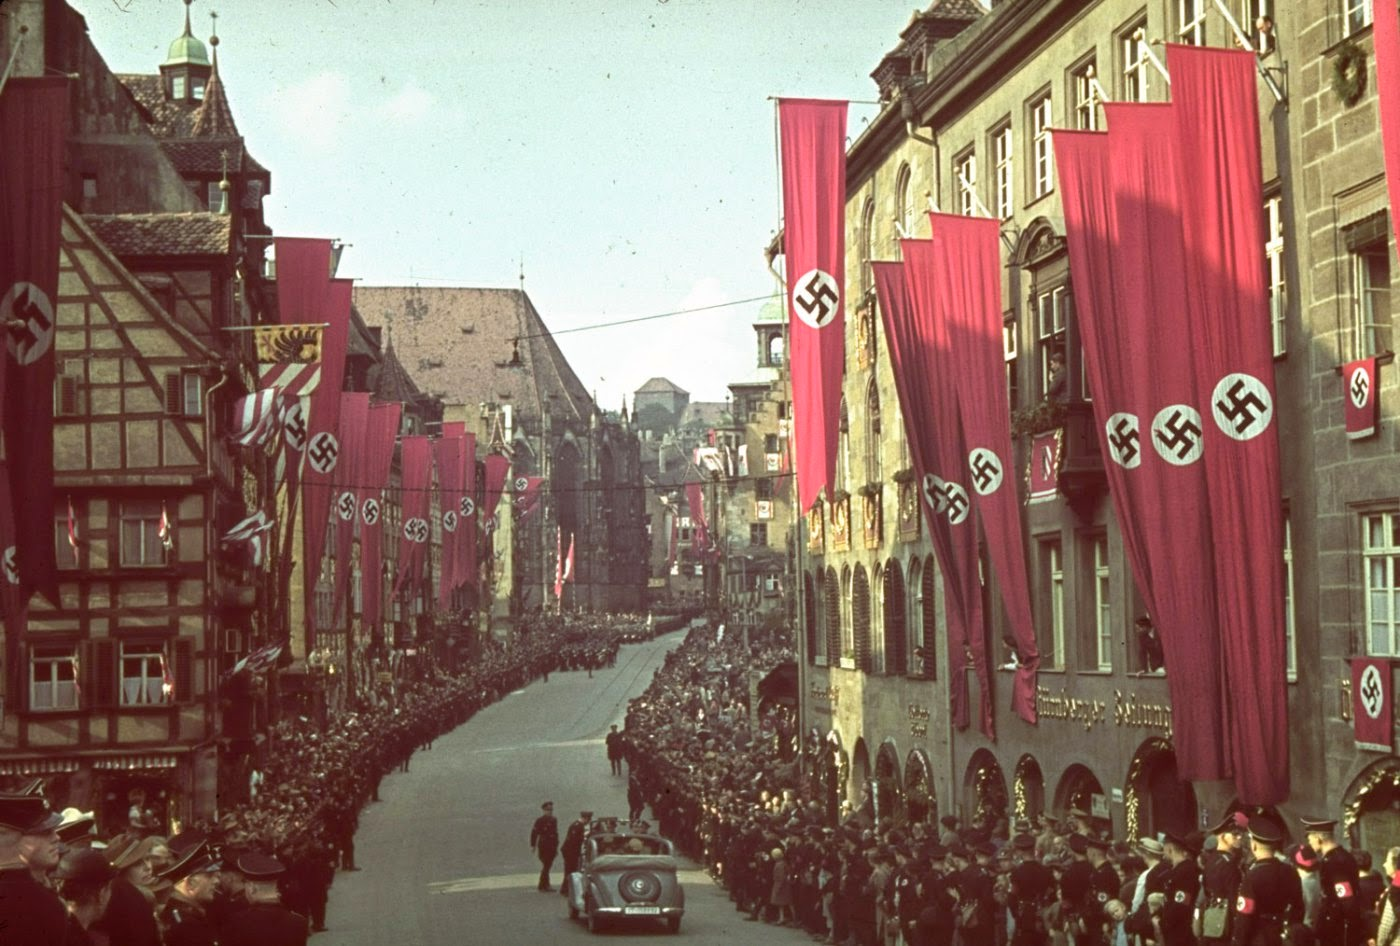 Nuremberg, Germany, 1938.